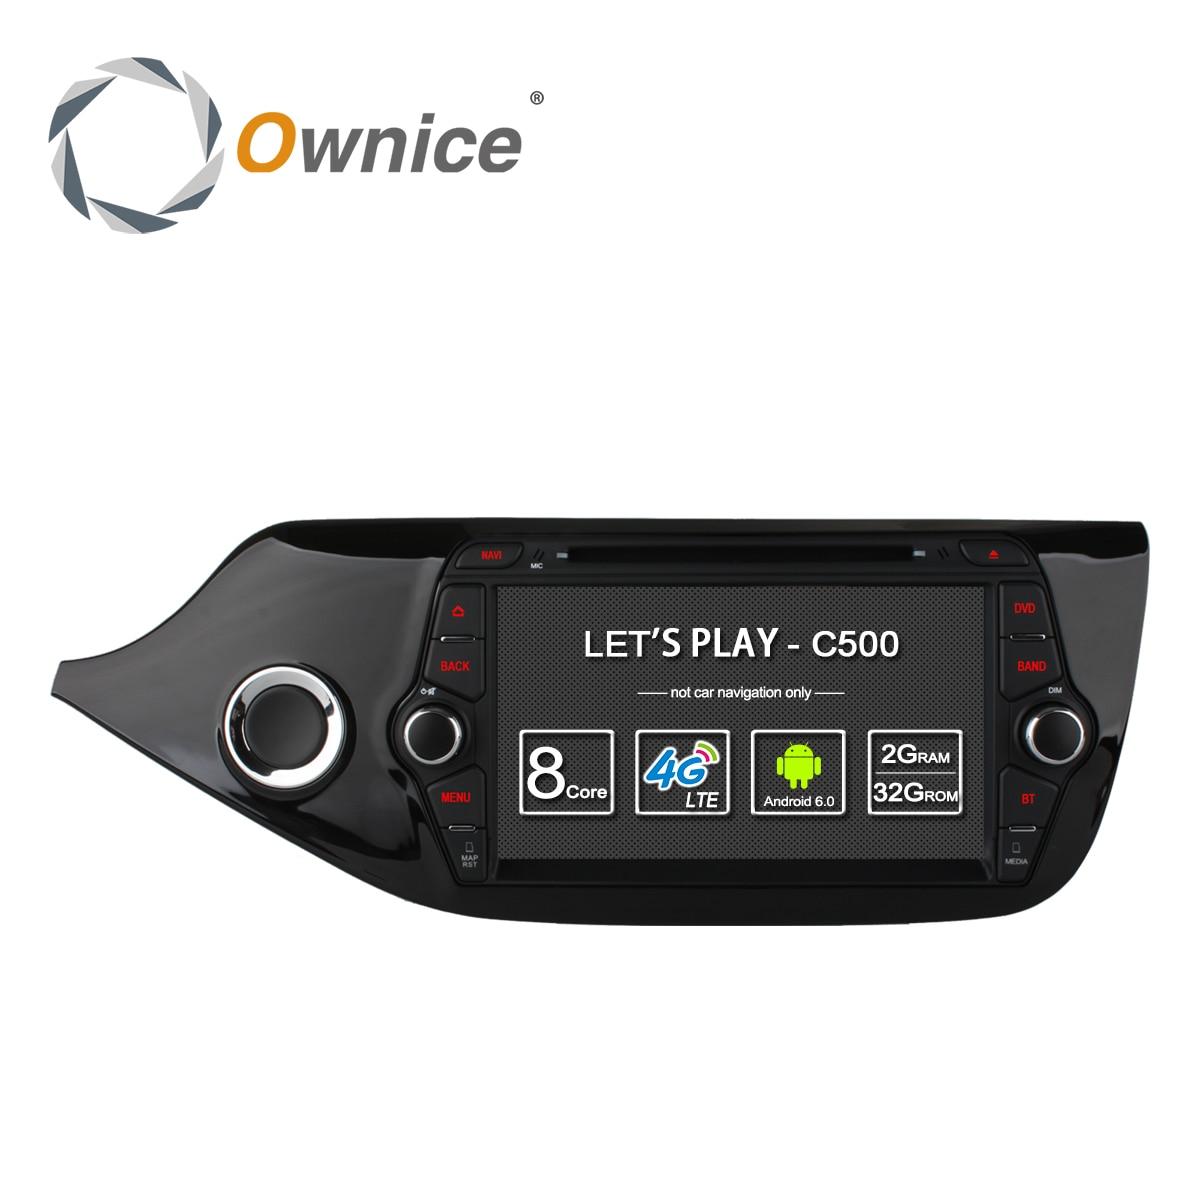 Ownice C500 4G SIM LTE Octa 8 Core Android 6.0 For Kia CEED 2013-2015 Car DVD Player GPS Navi Radio WIFI 4G BT 2GB RAM 32G ROM ownice c500 4g sim lte octa 8 core android 6 0 for kia ceed 2013 2015 car dvd player gps navi radio wifi 4g bt 2gb ram 32g rom